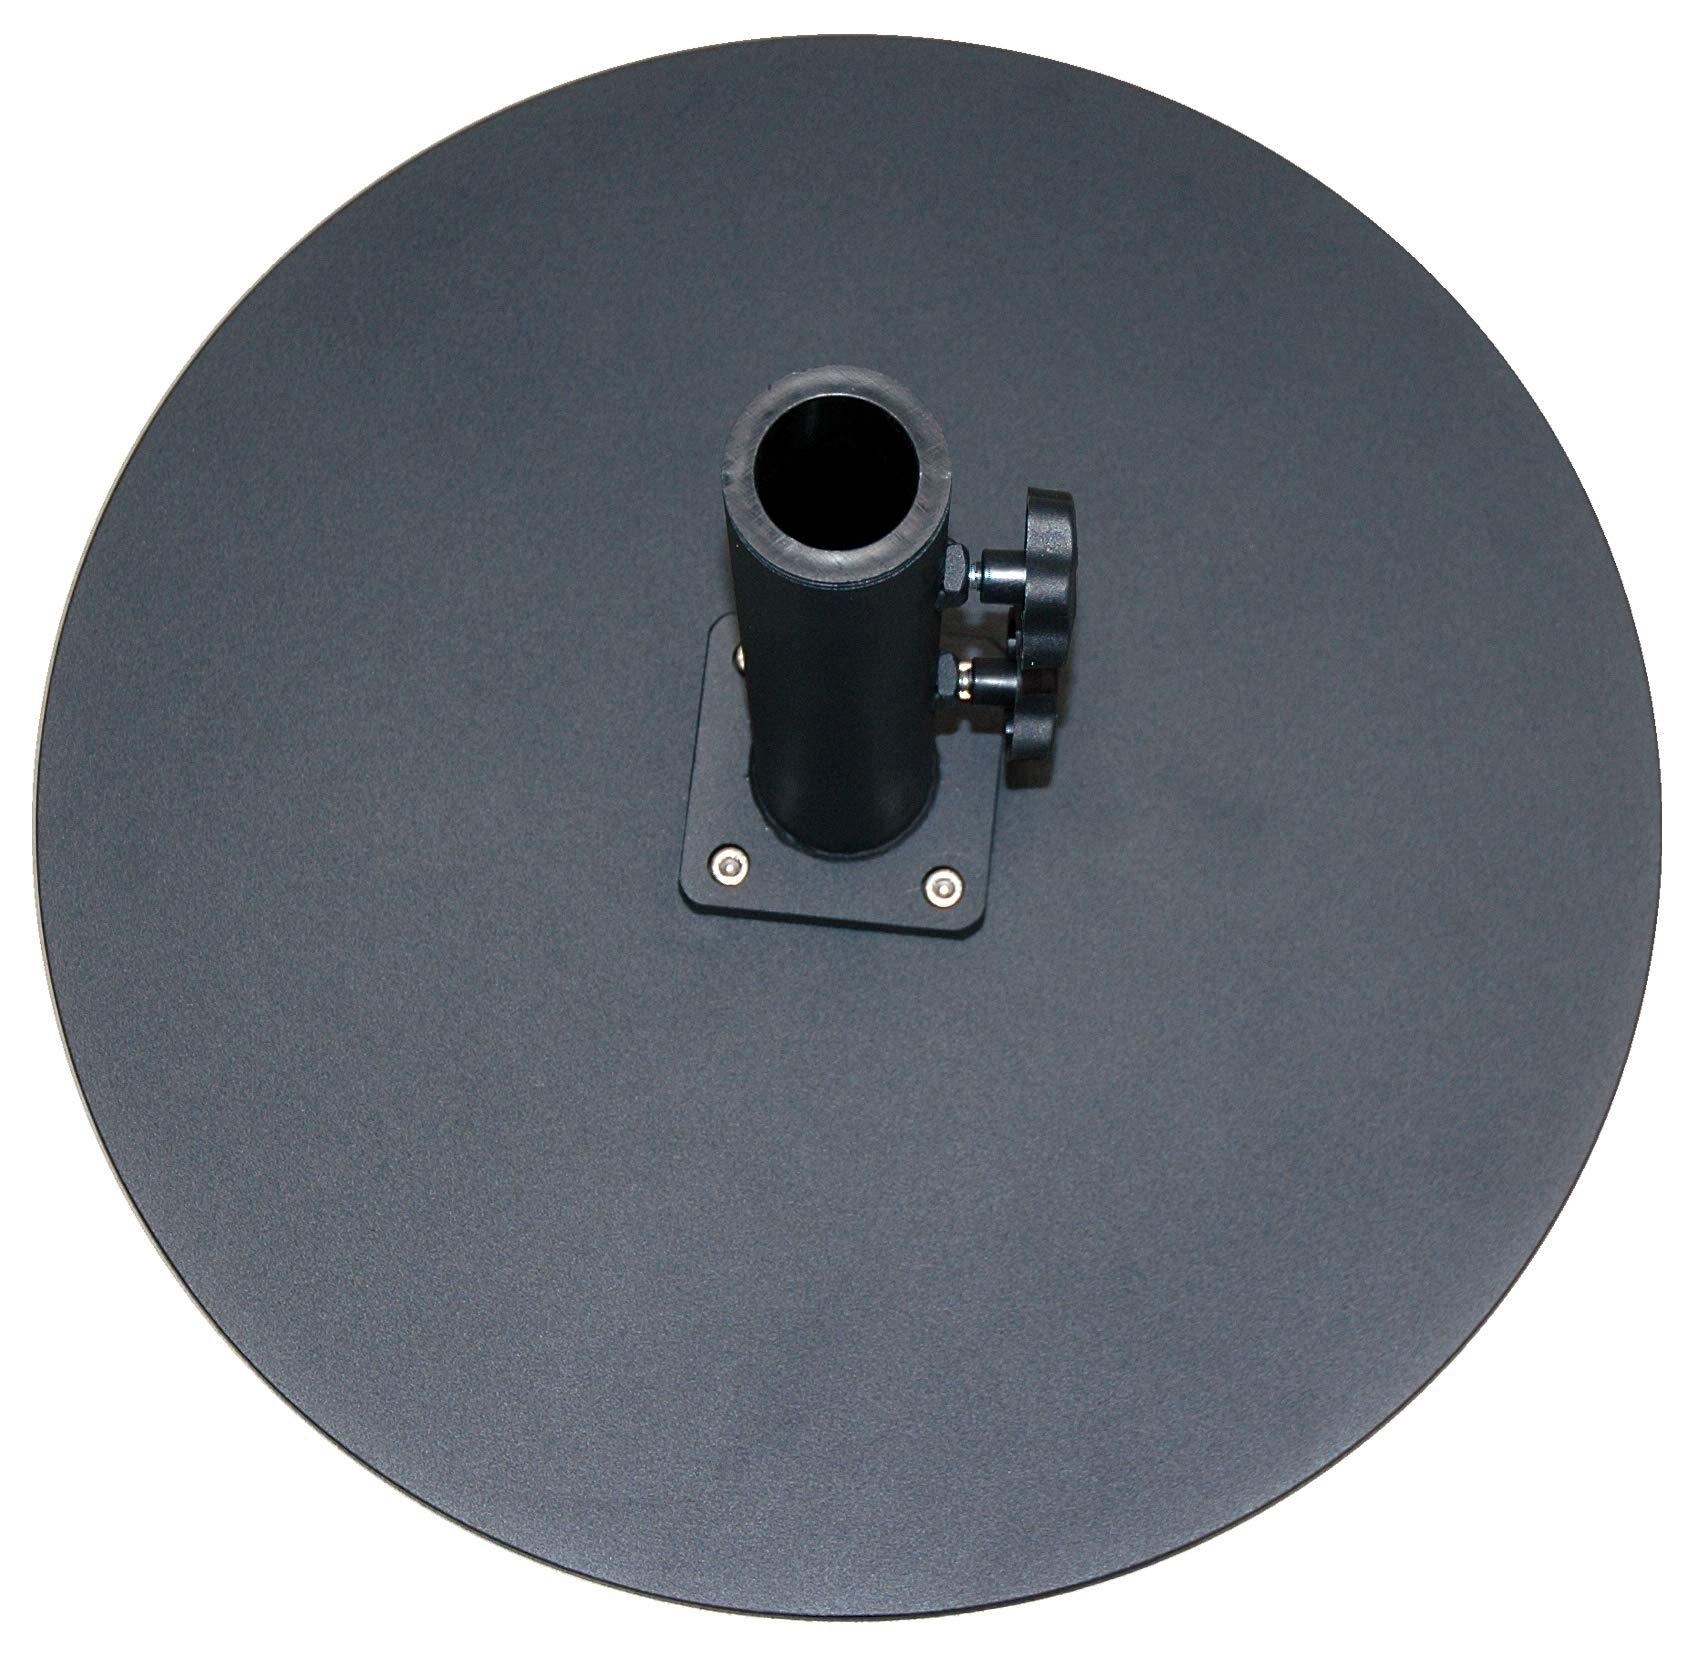 Tropishade Commercial Grade Steel Plate Umbrella Base, Black, 50 lbs